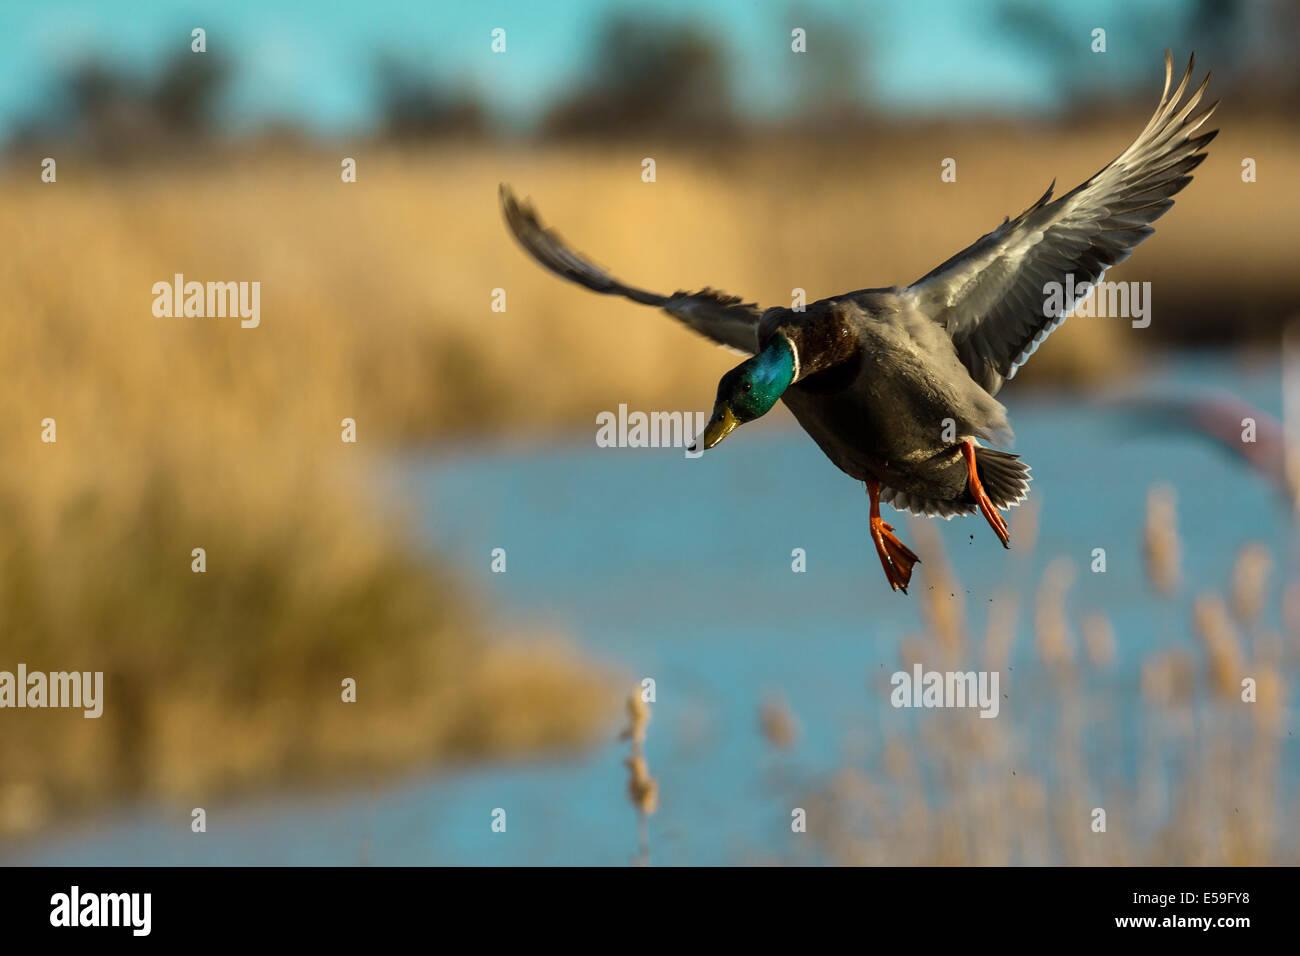 Pato salvaje, Anas platyrhynchos Imagen De Stock